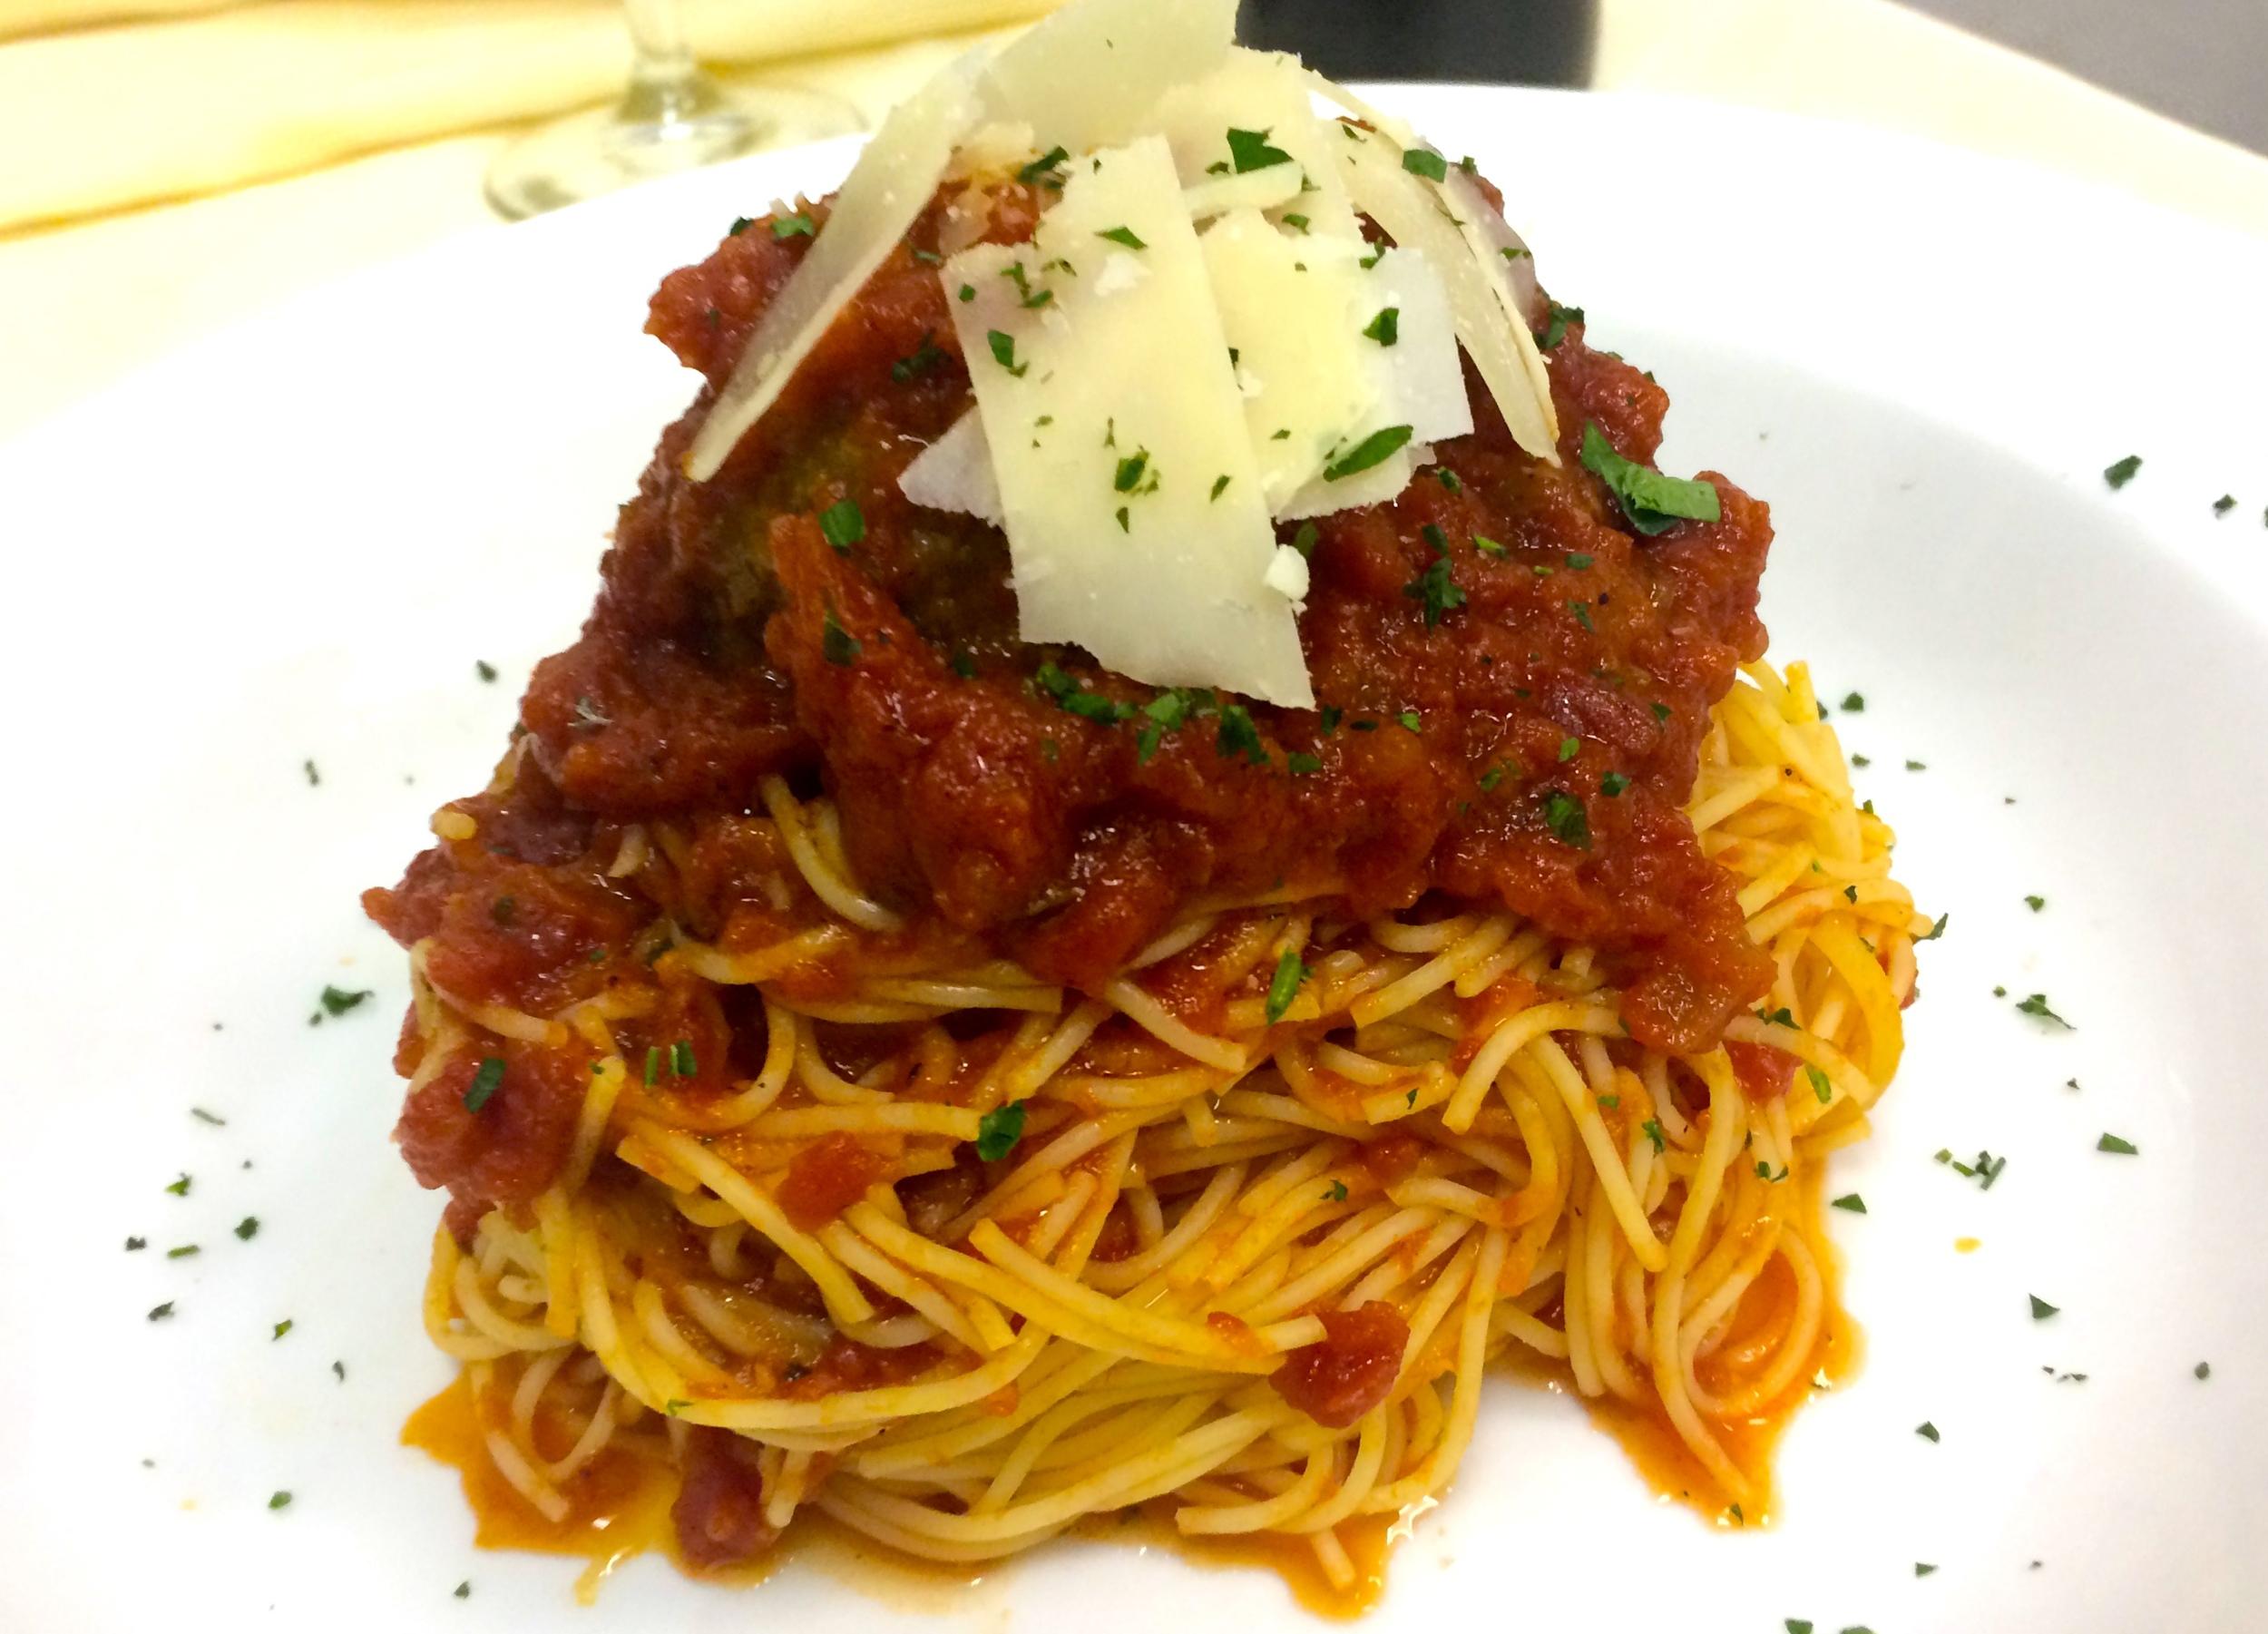 Homemade Meatball Over Spaghetti